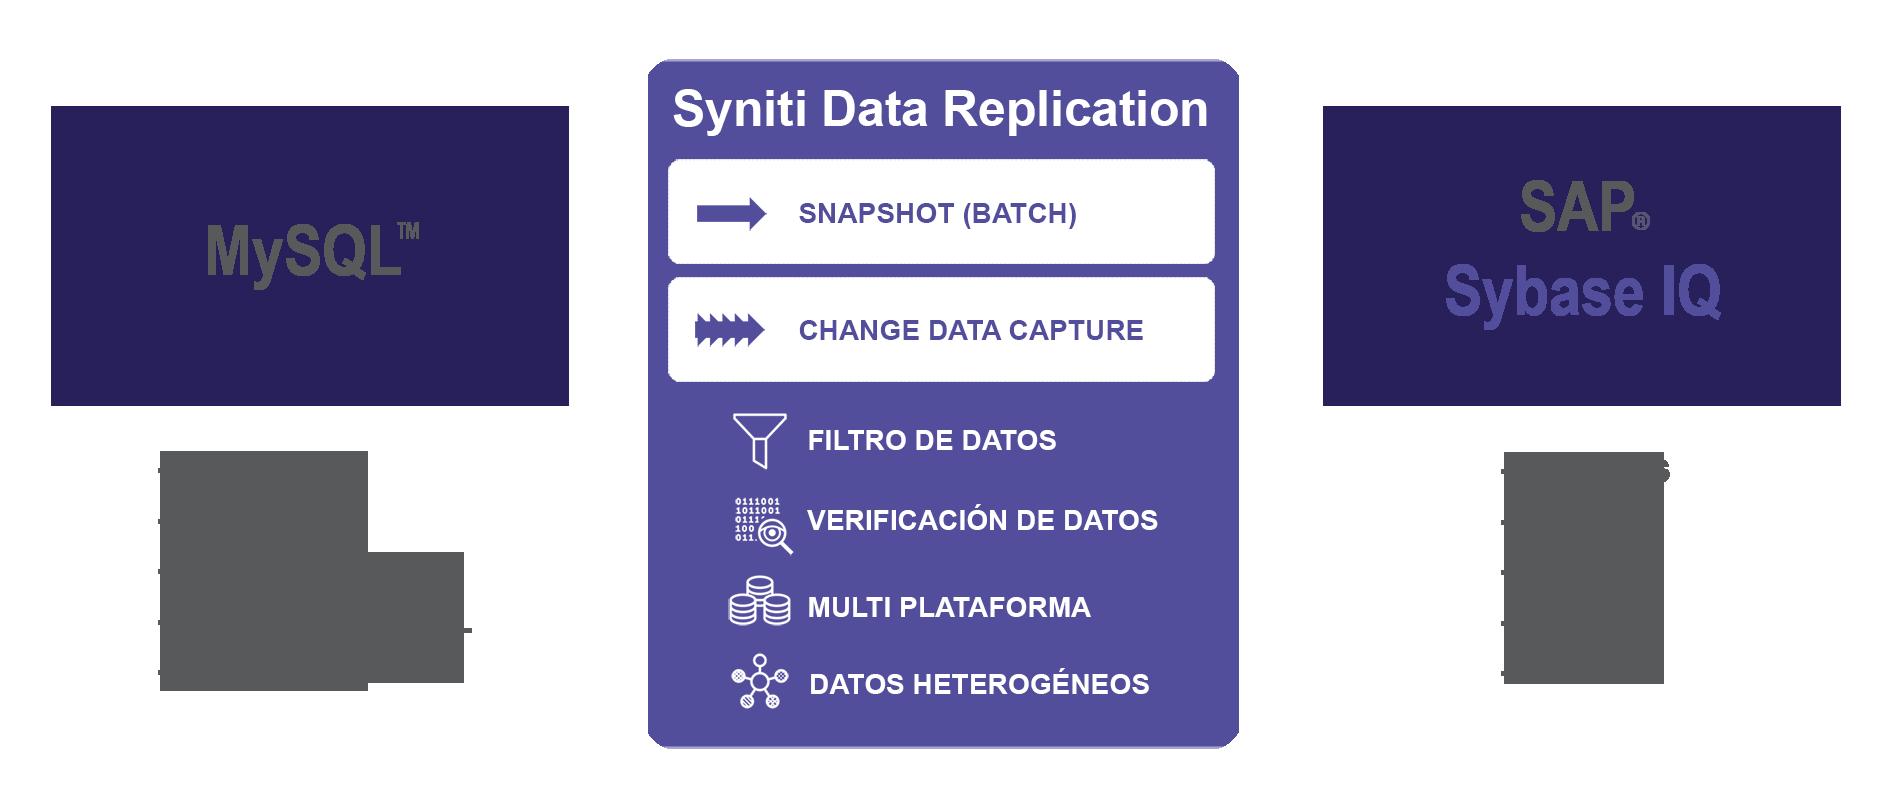 Replica de datos MySQl a SAP Sybase IQ